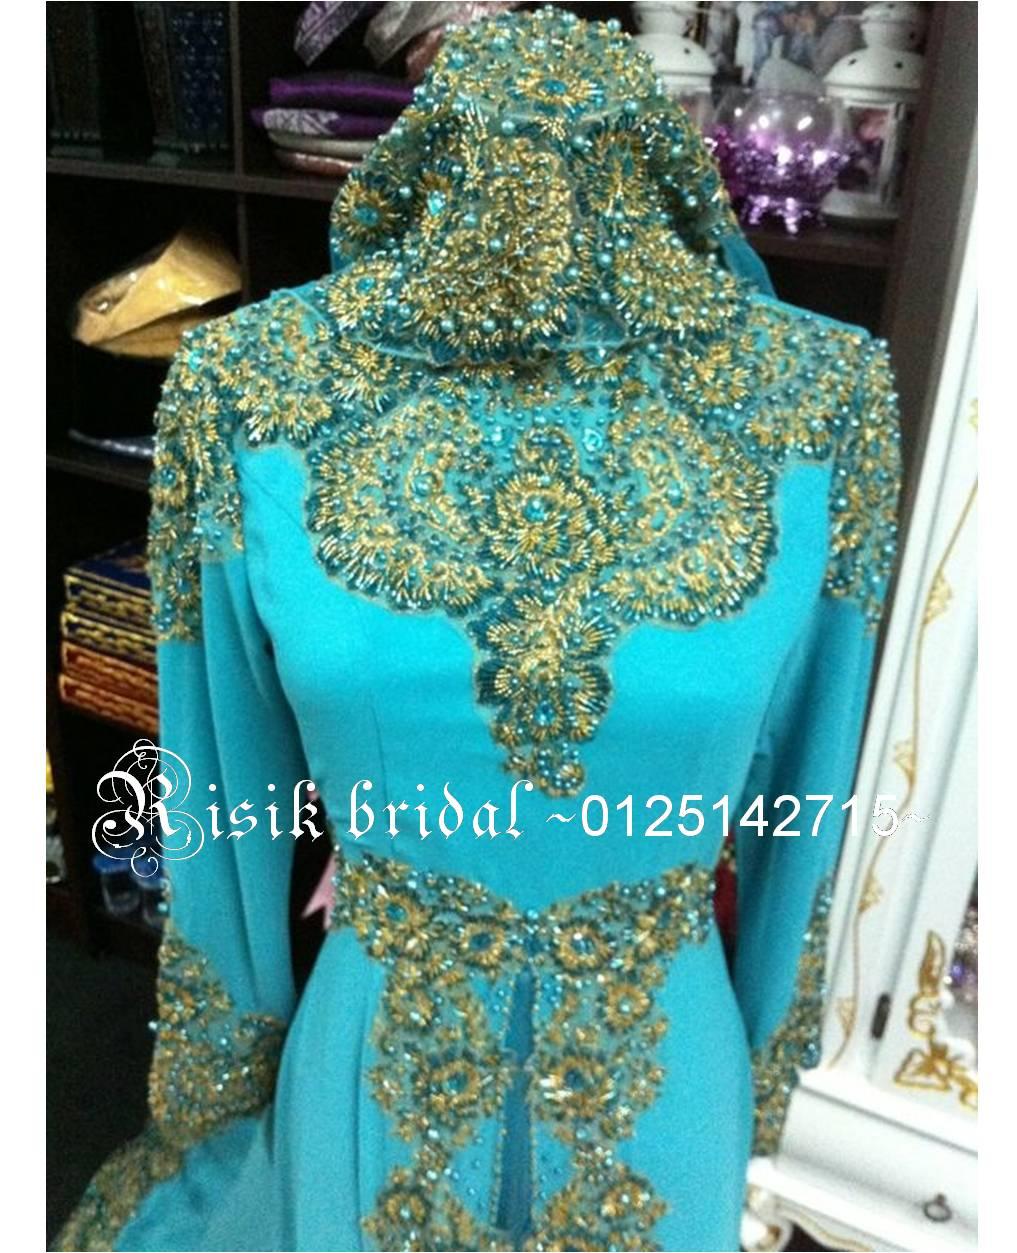 Baju Pengantin Hijau Turquoise